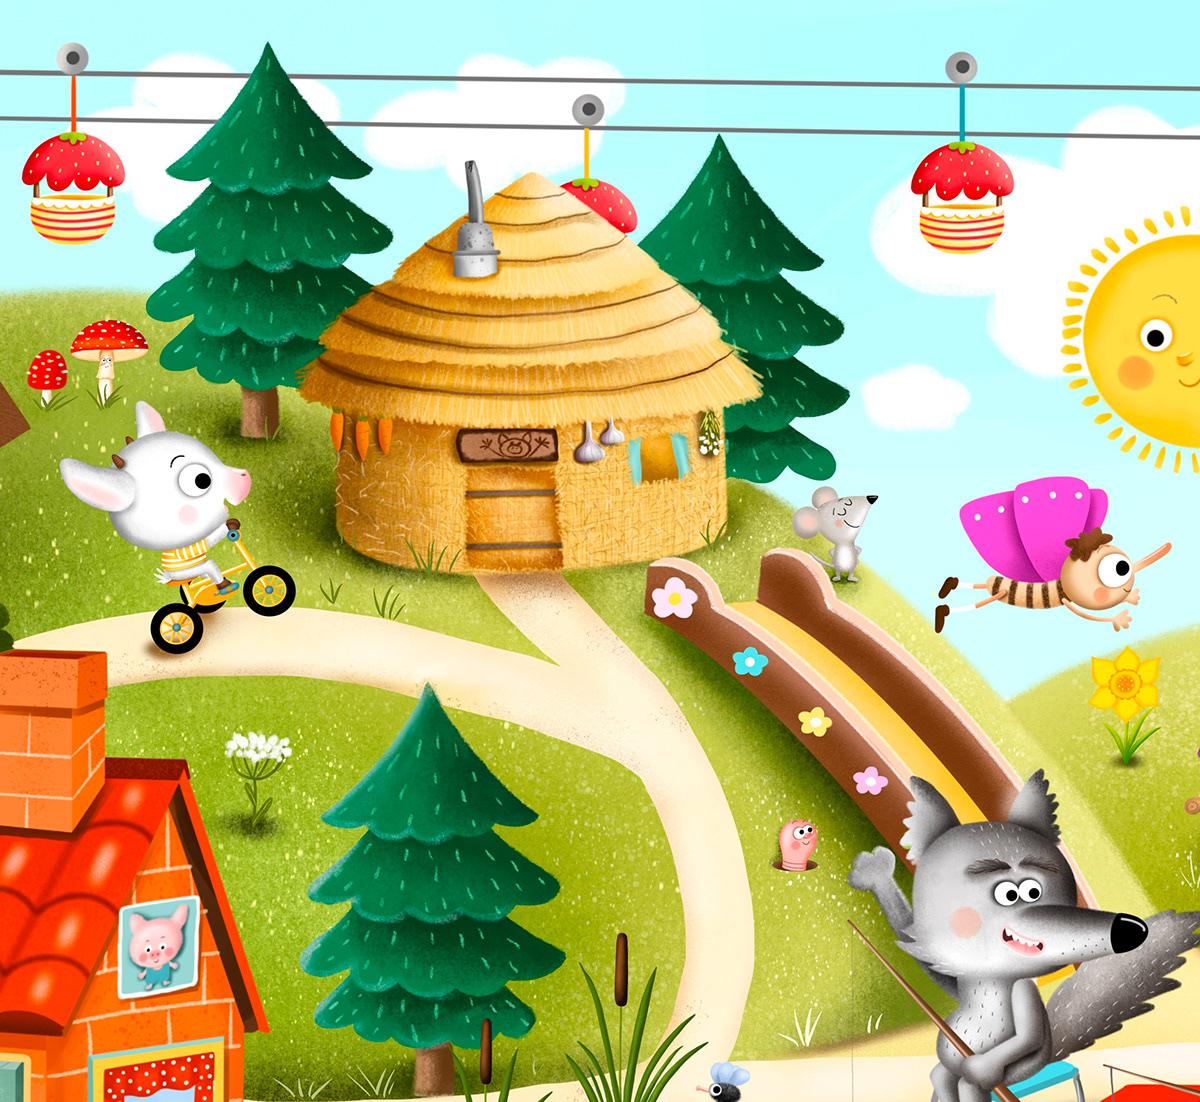 animal bookillustration Character children ChildrenIllustration cute digitalart fairytale Procreate